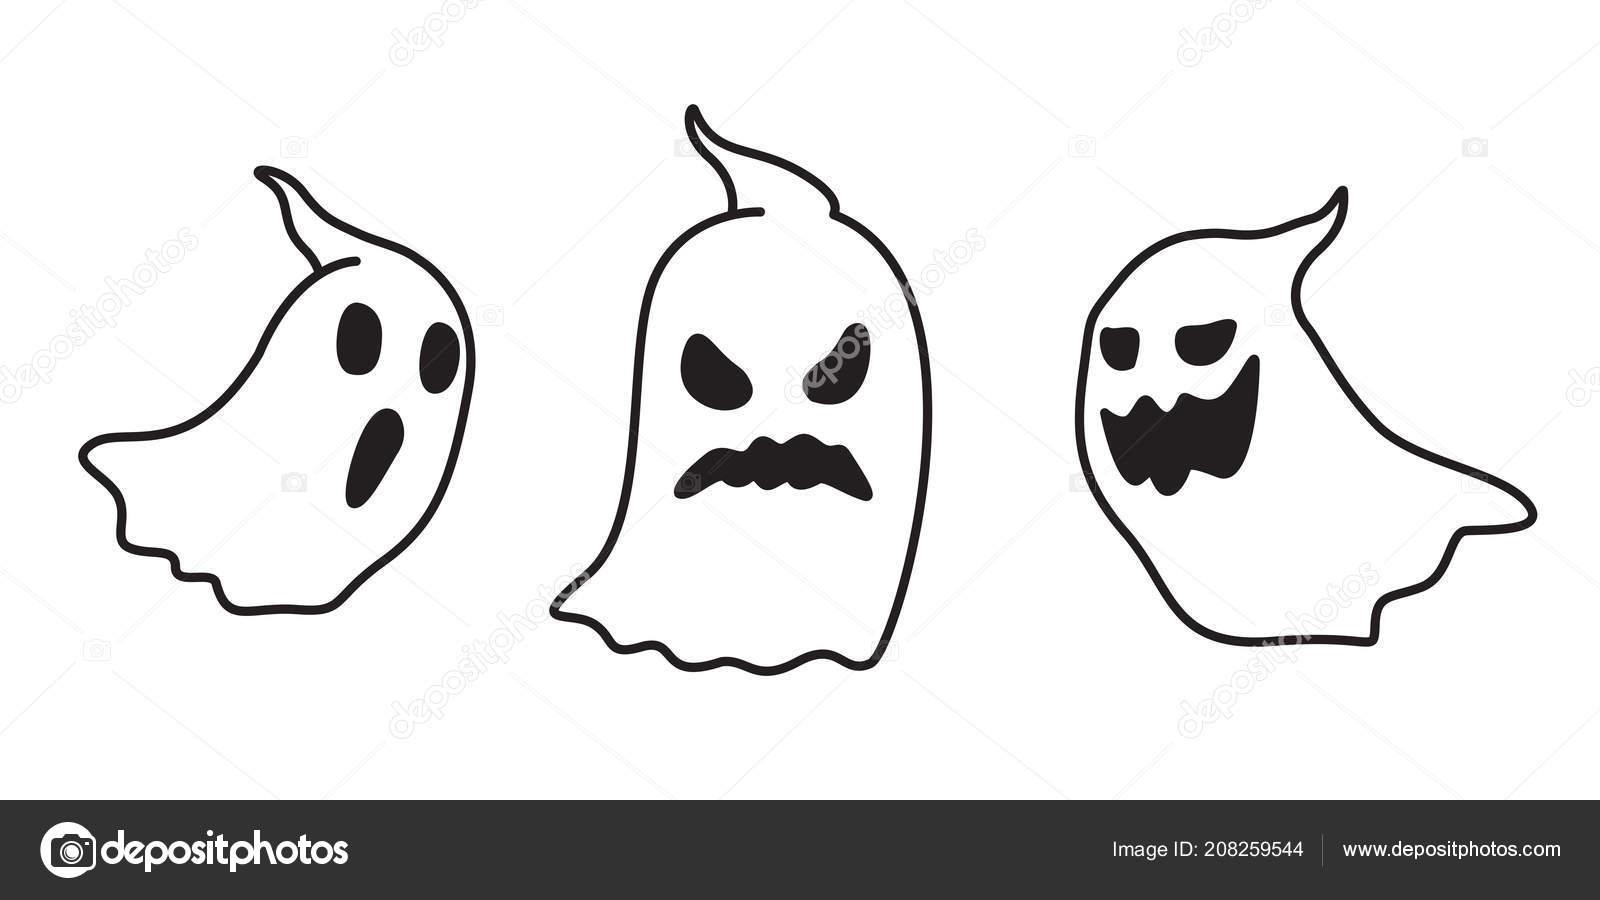 Ghost Vector Icon Halloween Spooky Doodle Cartoon Illustration